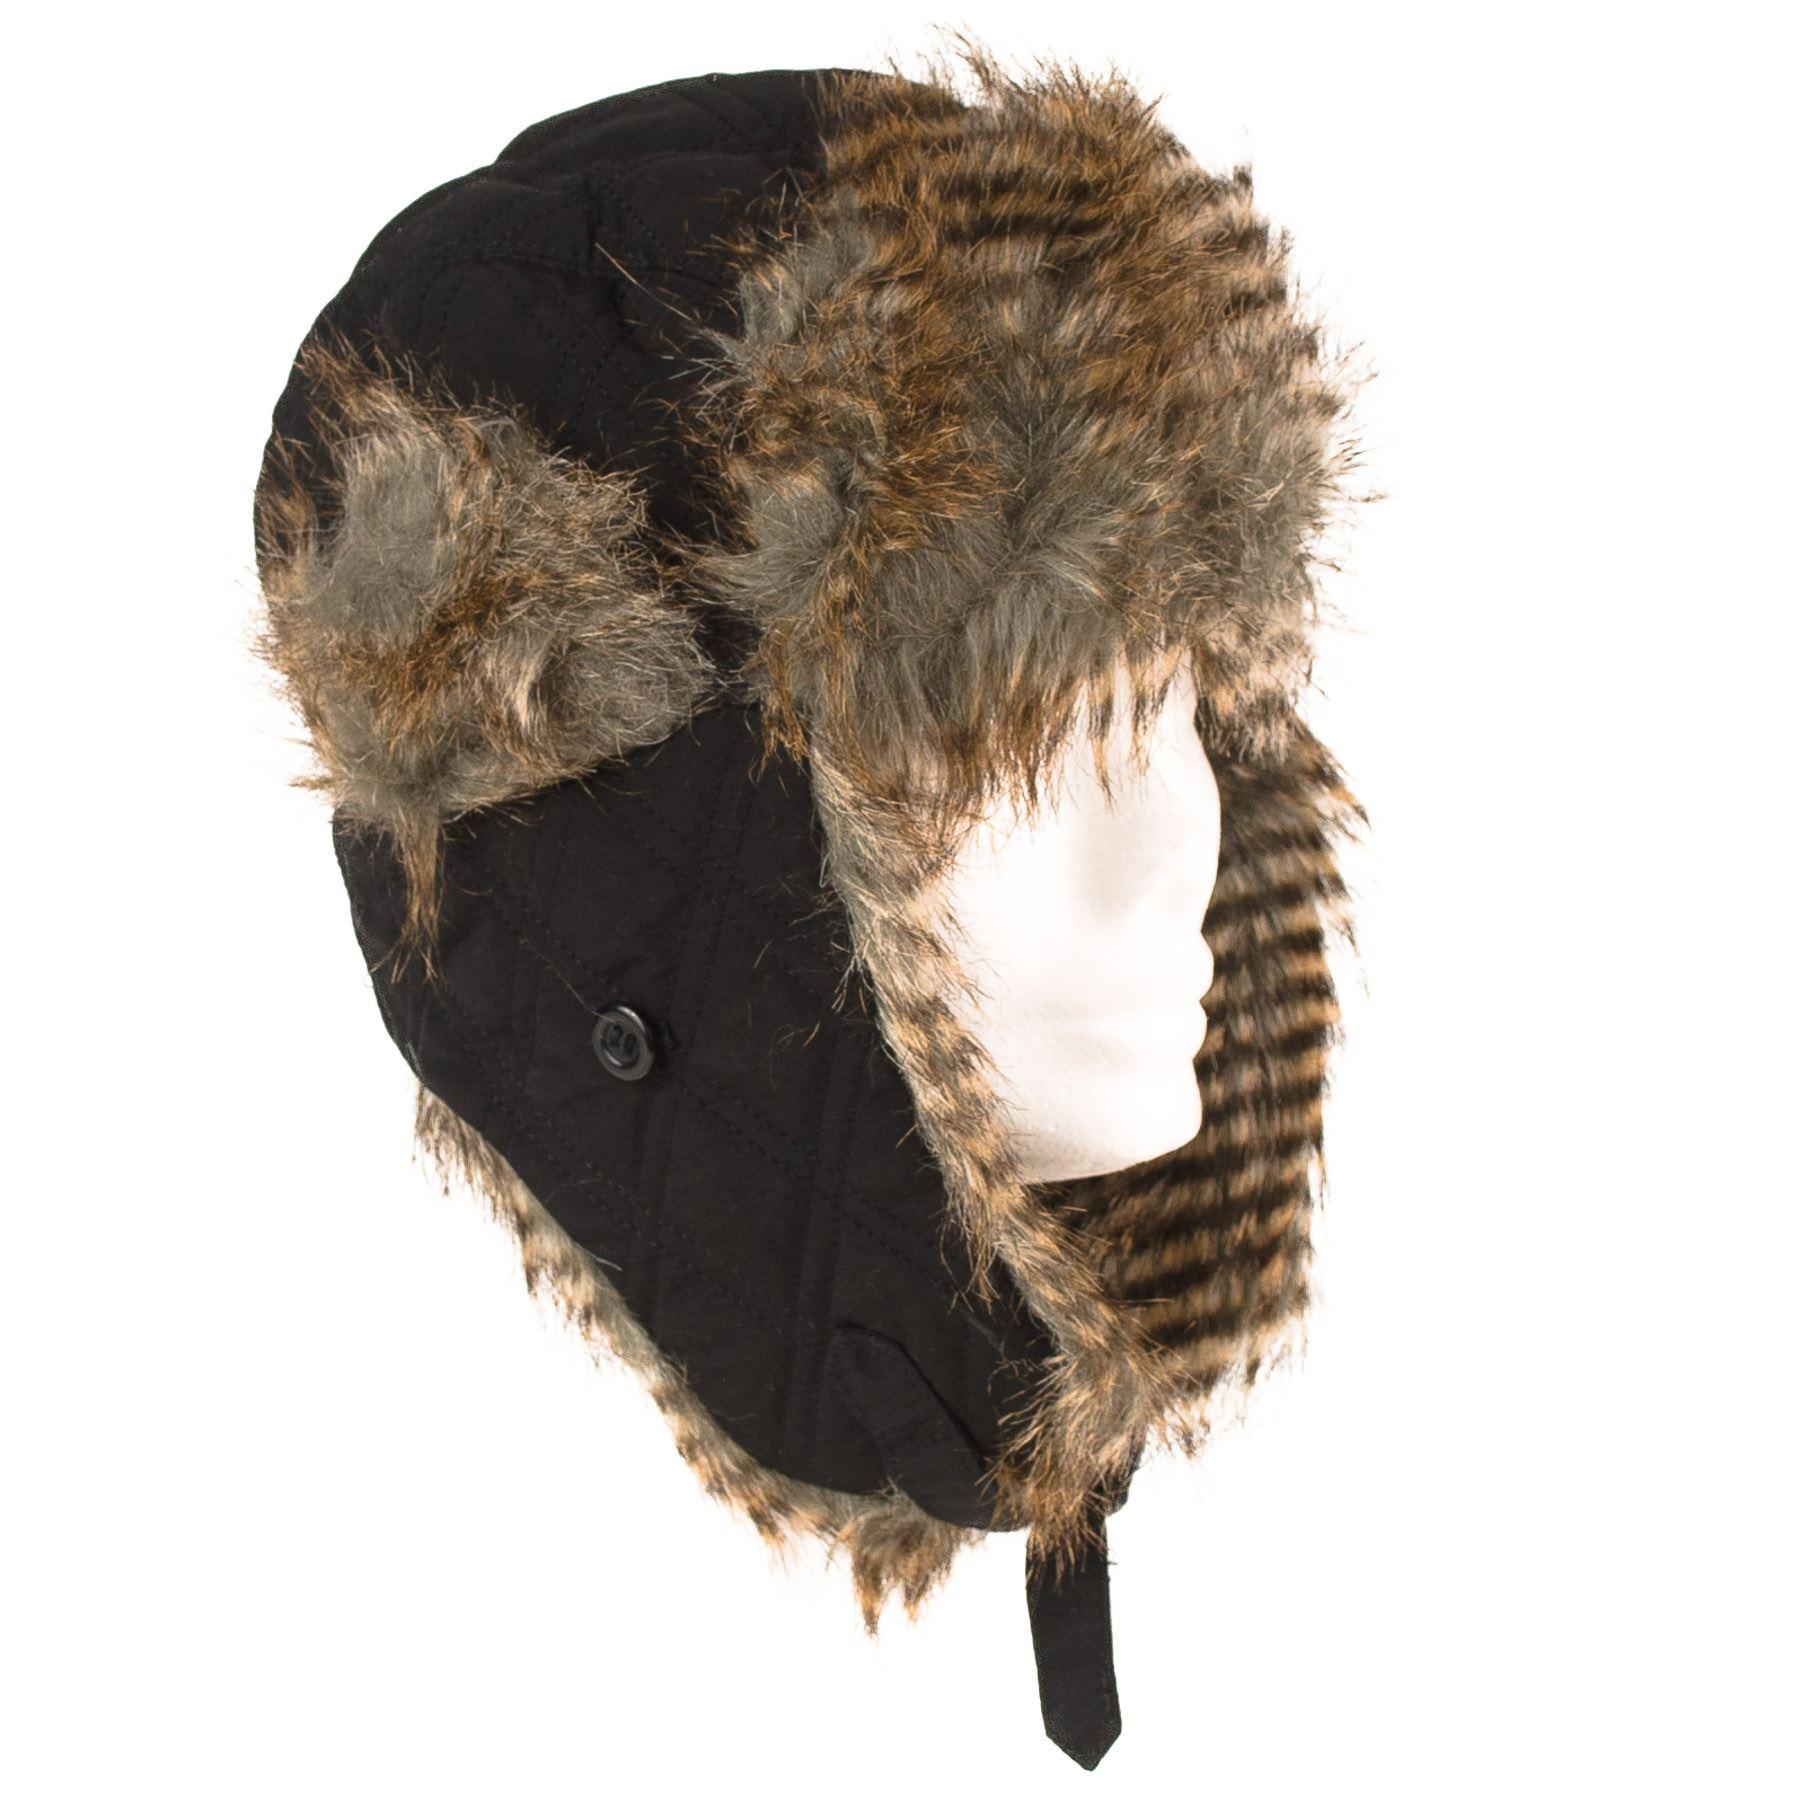 Faux Fur Aviator/Trapper Flap Hat Plain With Ear Flap Aviator/Trapper Purse Lock Buckle 0672b3